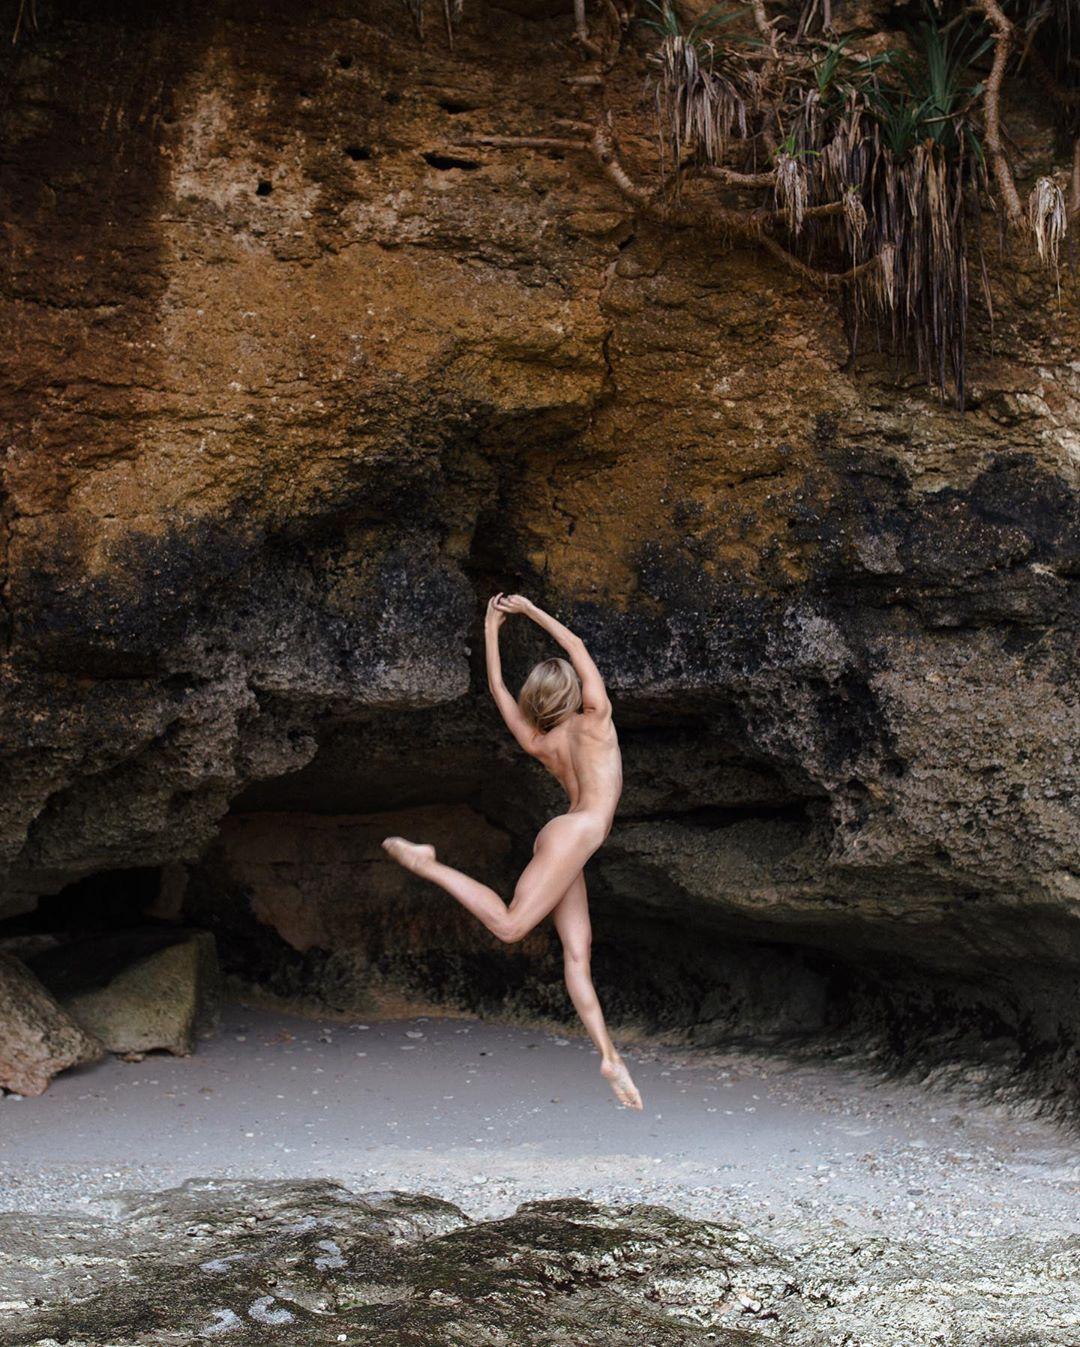 hot yoga workout poses